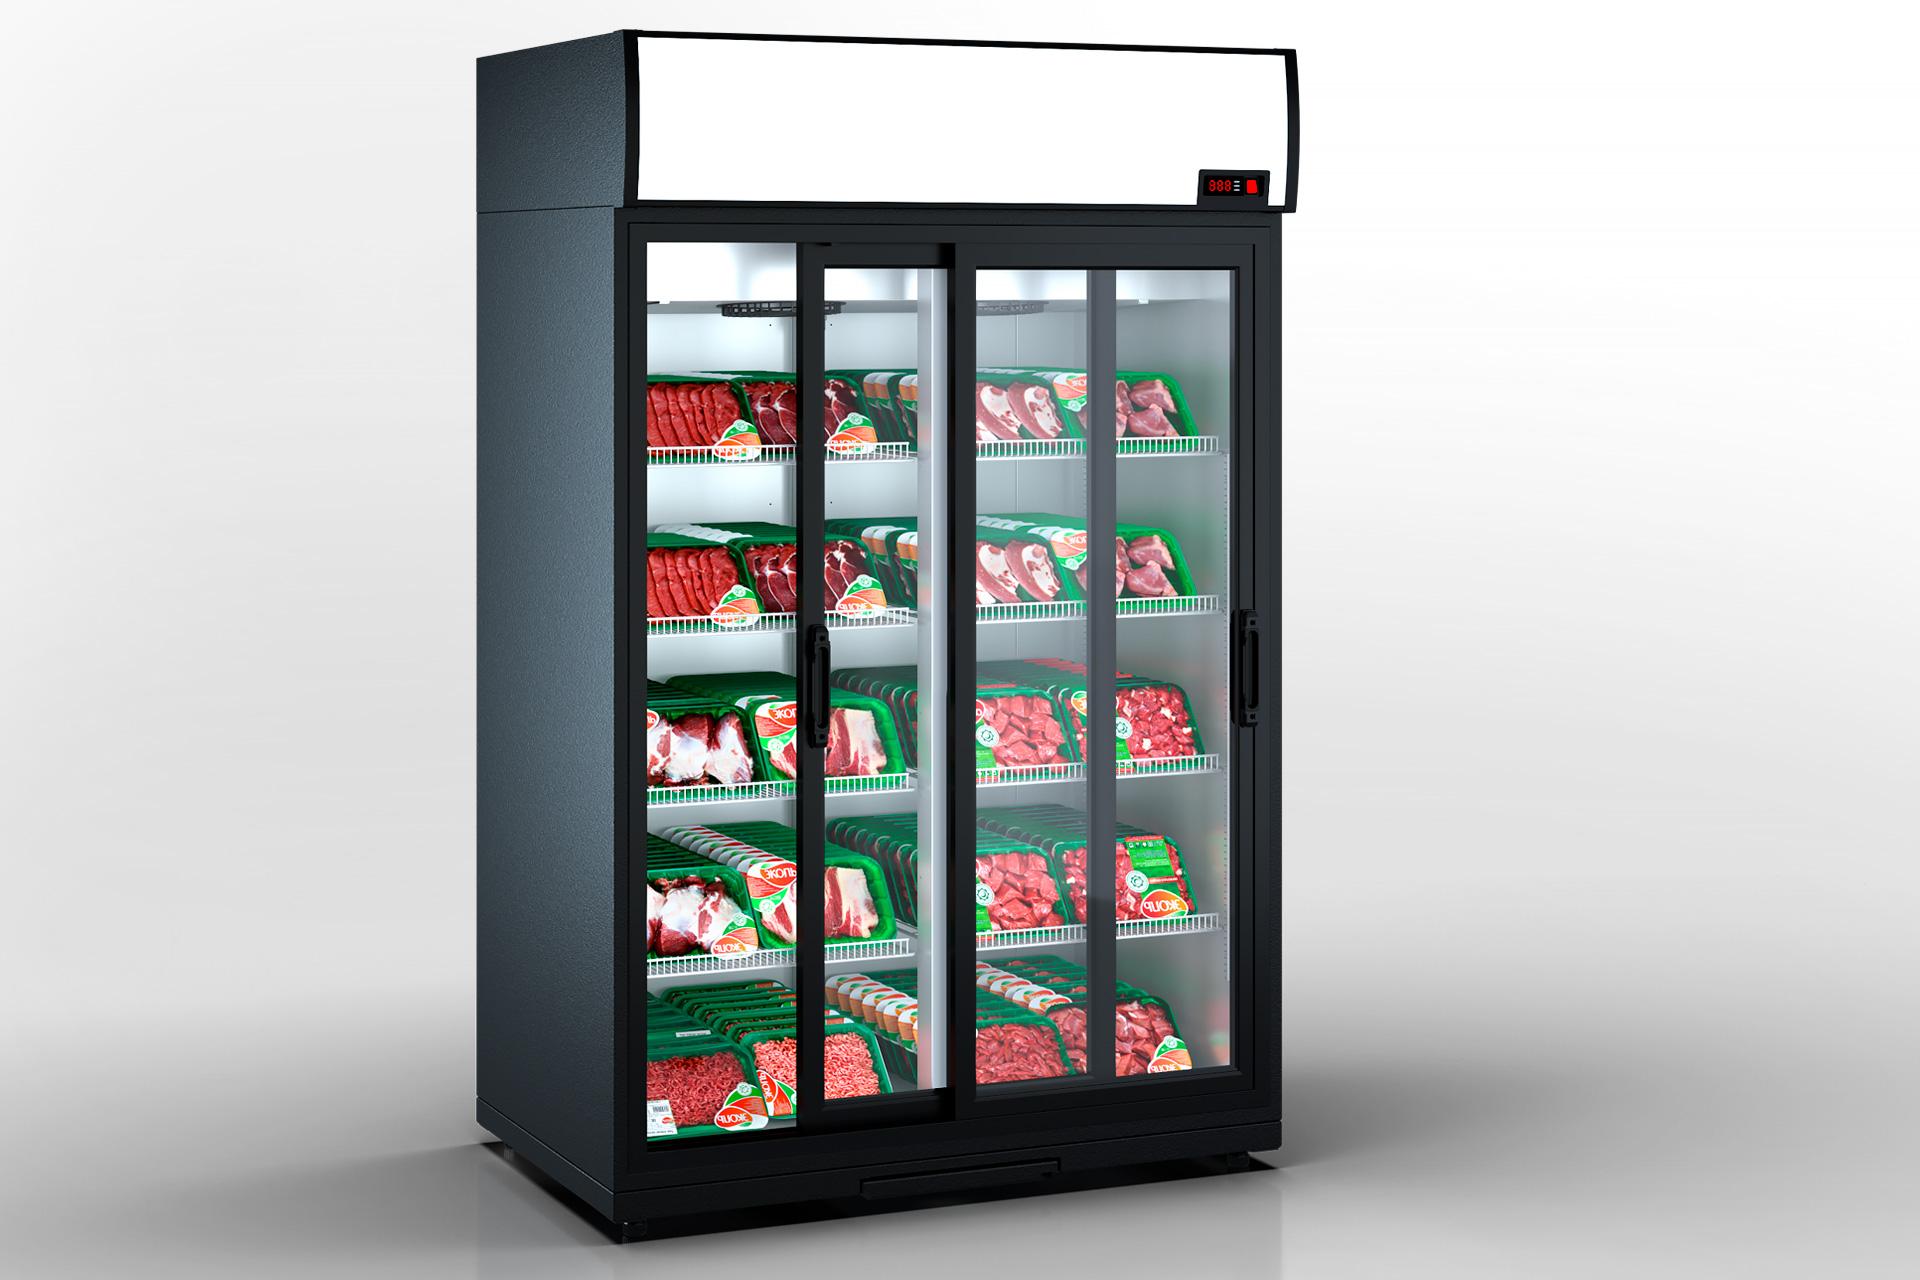 Refrigerated cabinets Kansas VА1SG 080 MT/HT SD 210-D1200A-132